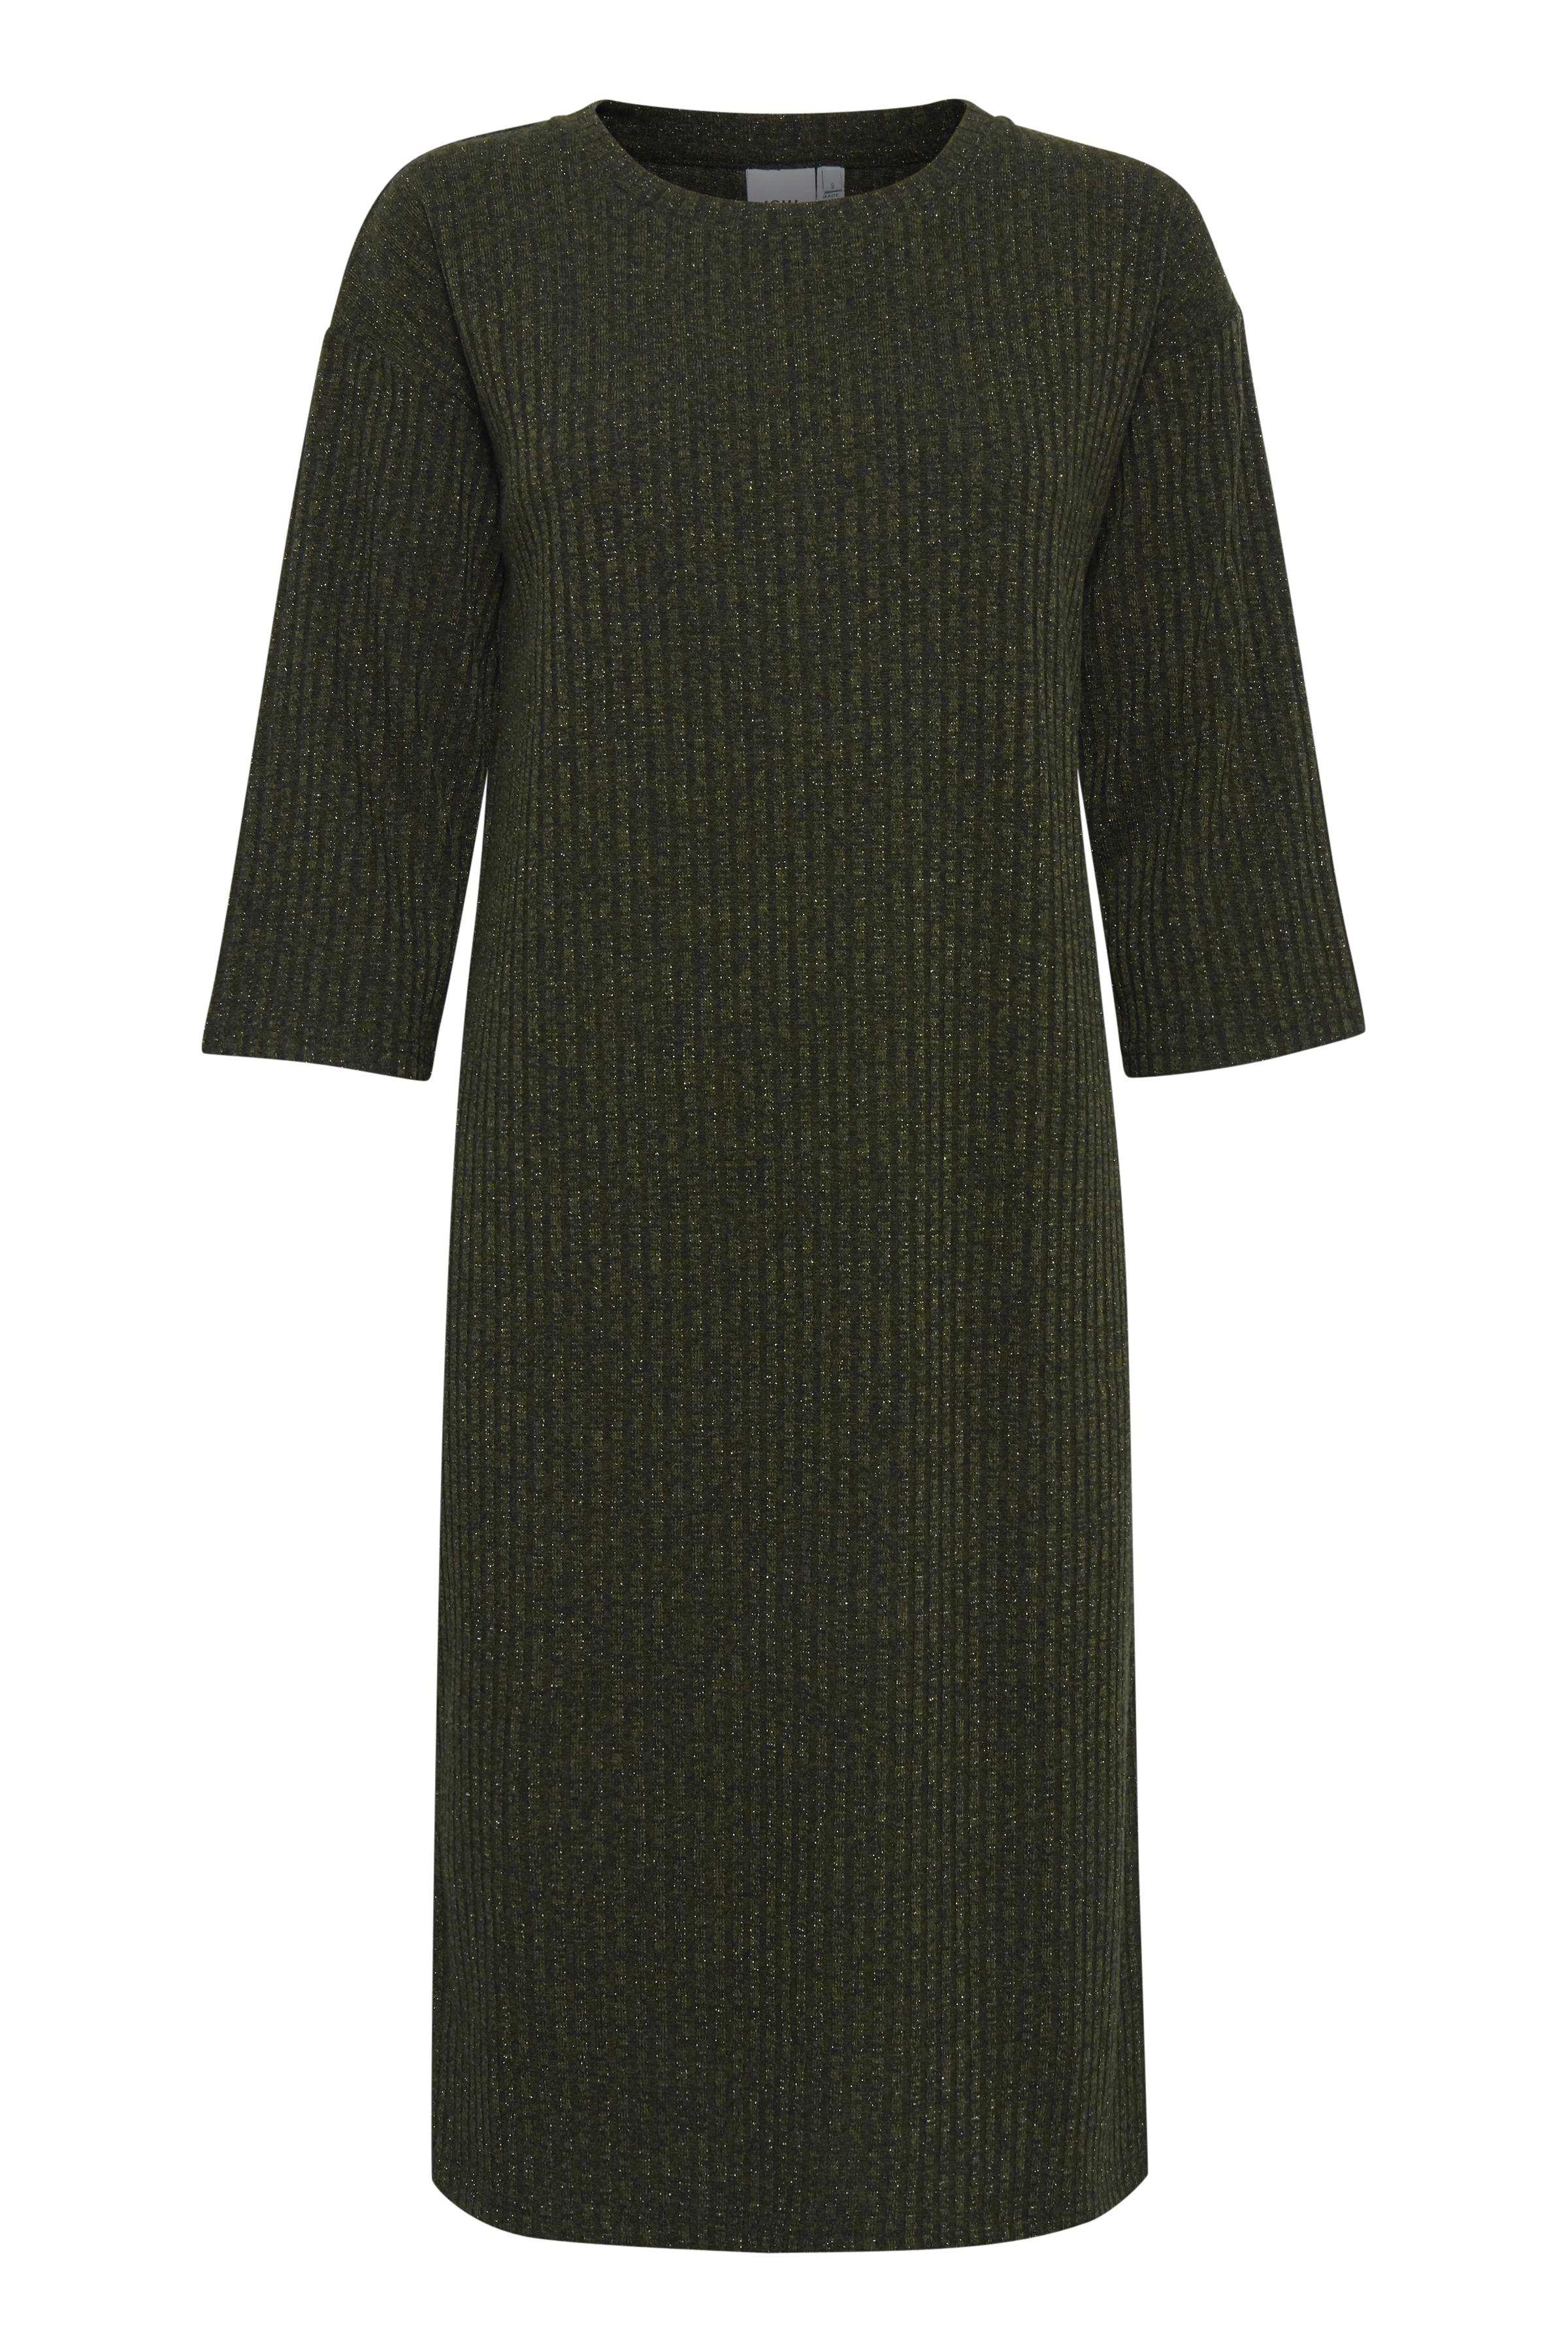 Ichi Dame Jersey jurk - Duffel Bag